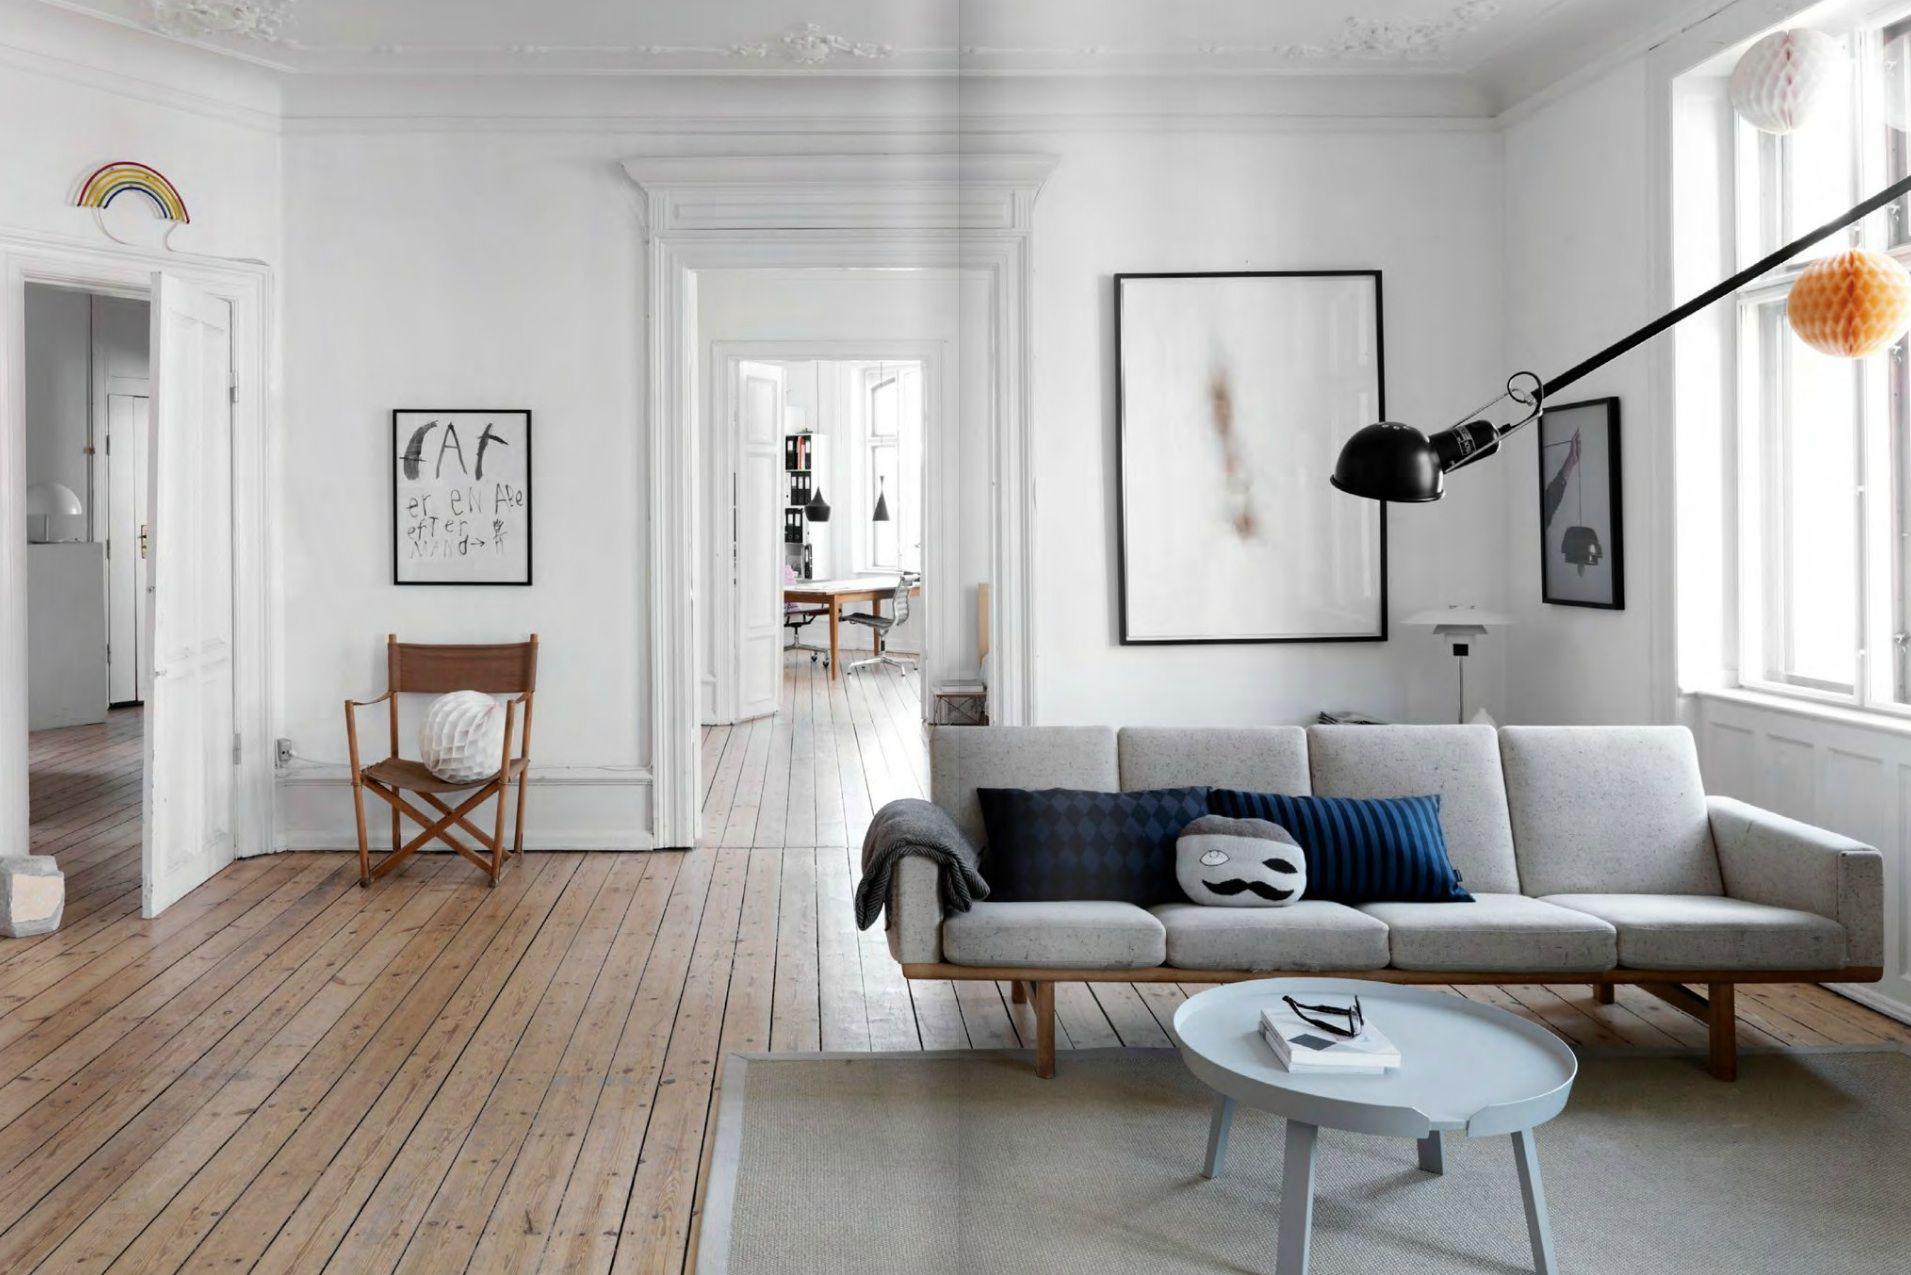 scandinavian interior design - 1000+ images about Scandinavian Design on Pinterest Scandinavian ...